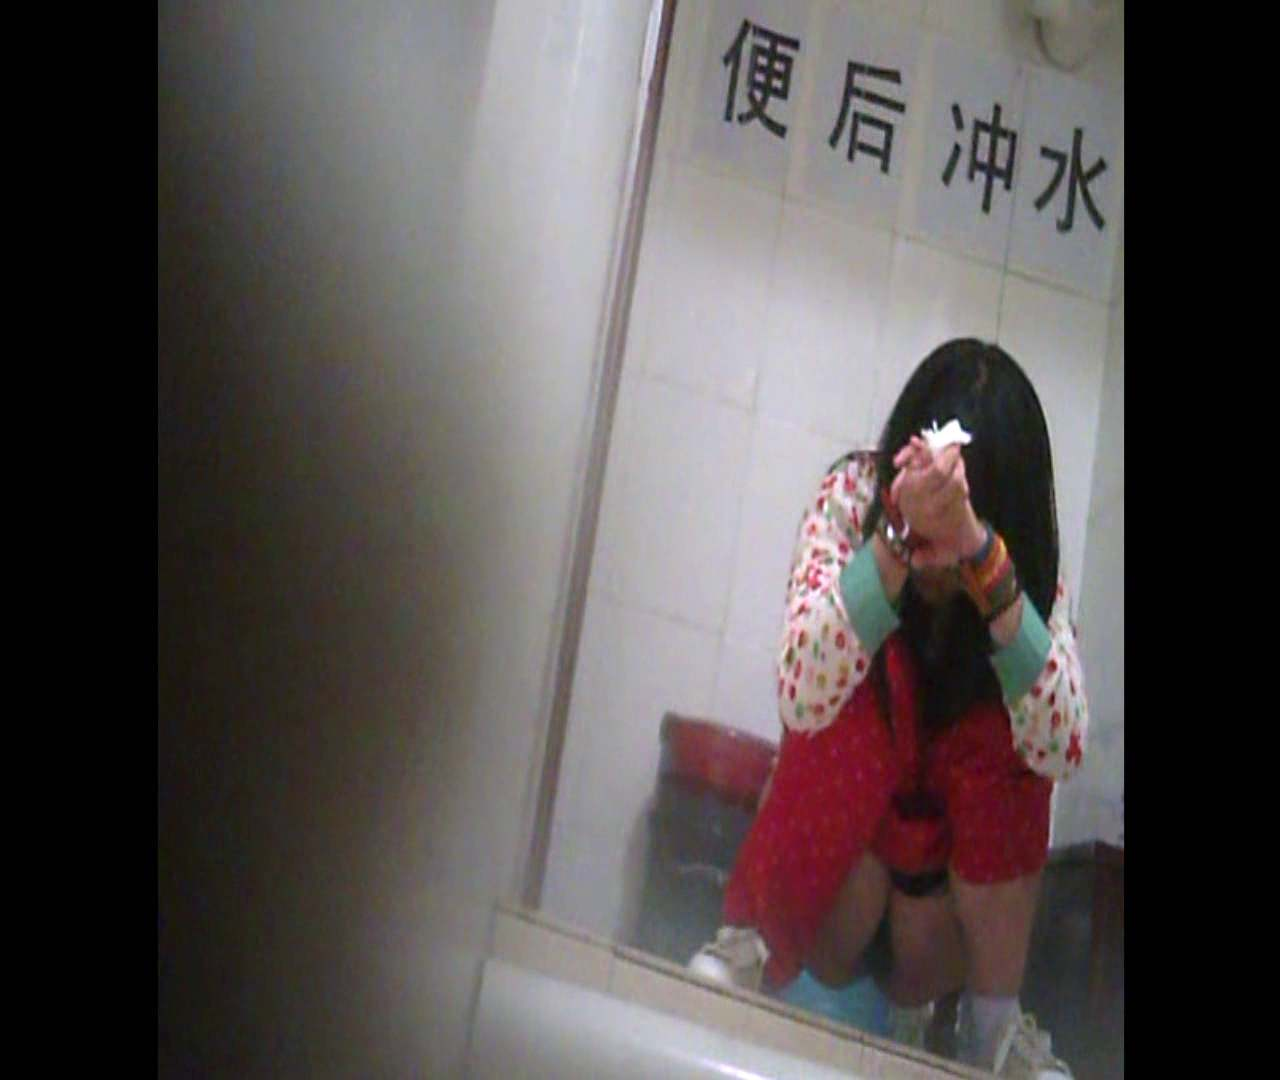 Vol.01 赤のパンツスタイルがとっても眩しい!! 洗面所 | 丸見え  61画像 52